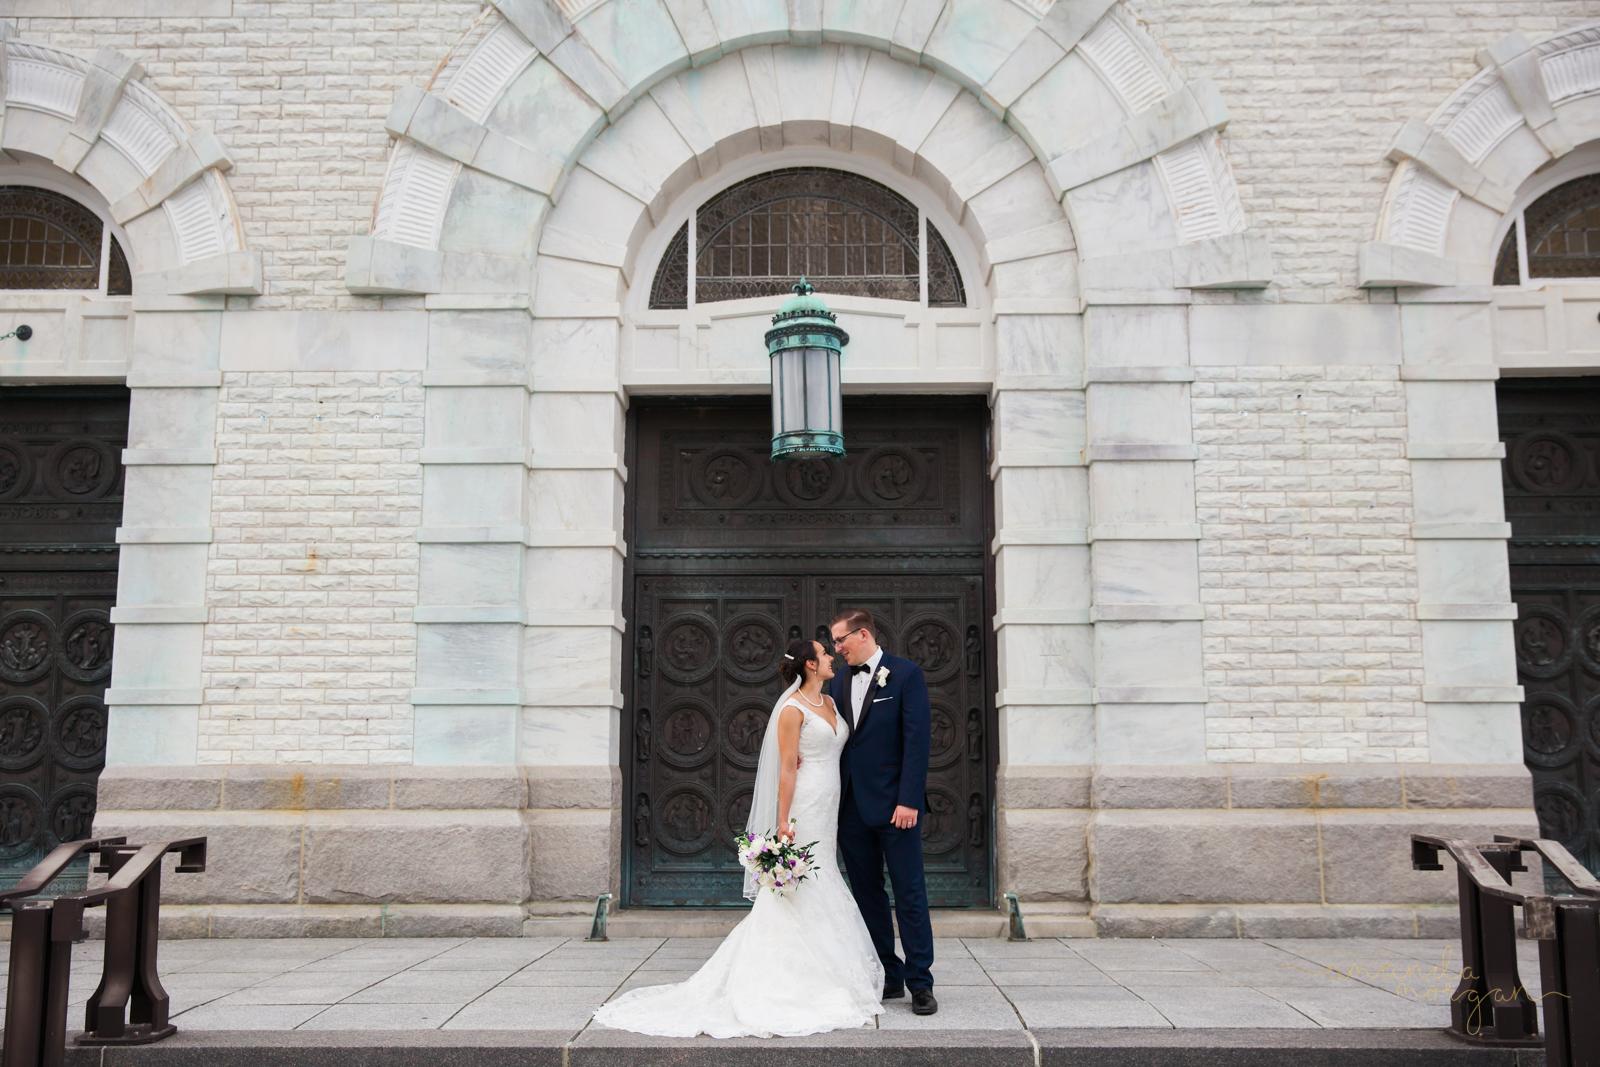 Notre-Dame-Catholic-Church-Wedding-Amanda-Morgan-21.jpg